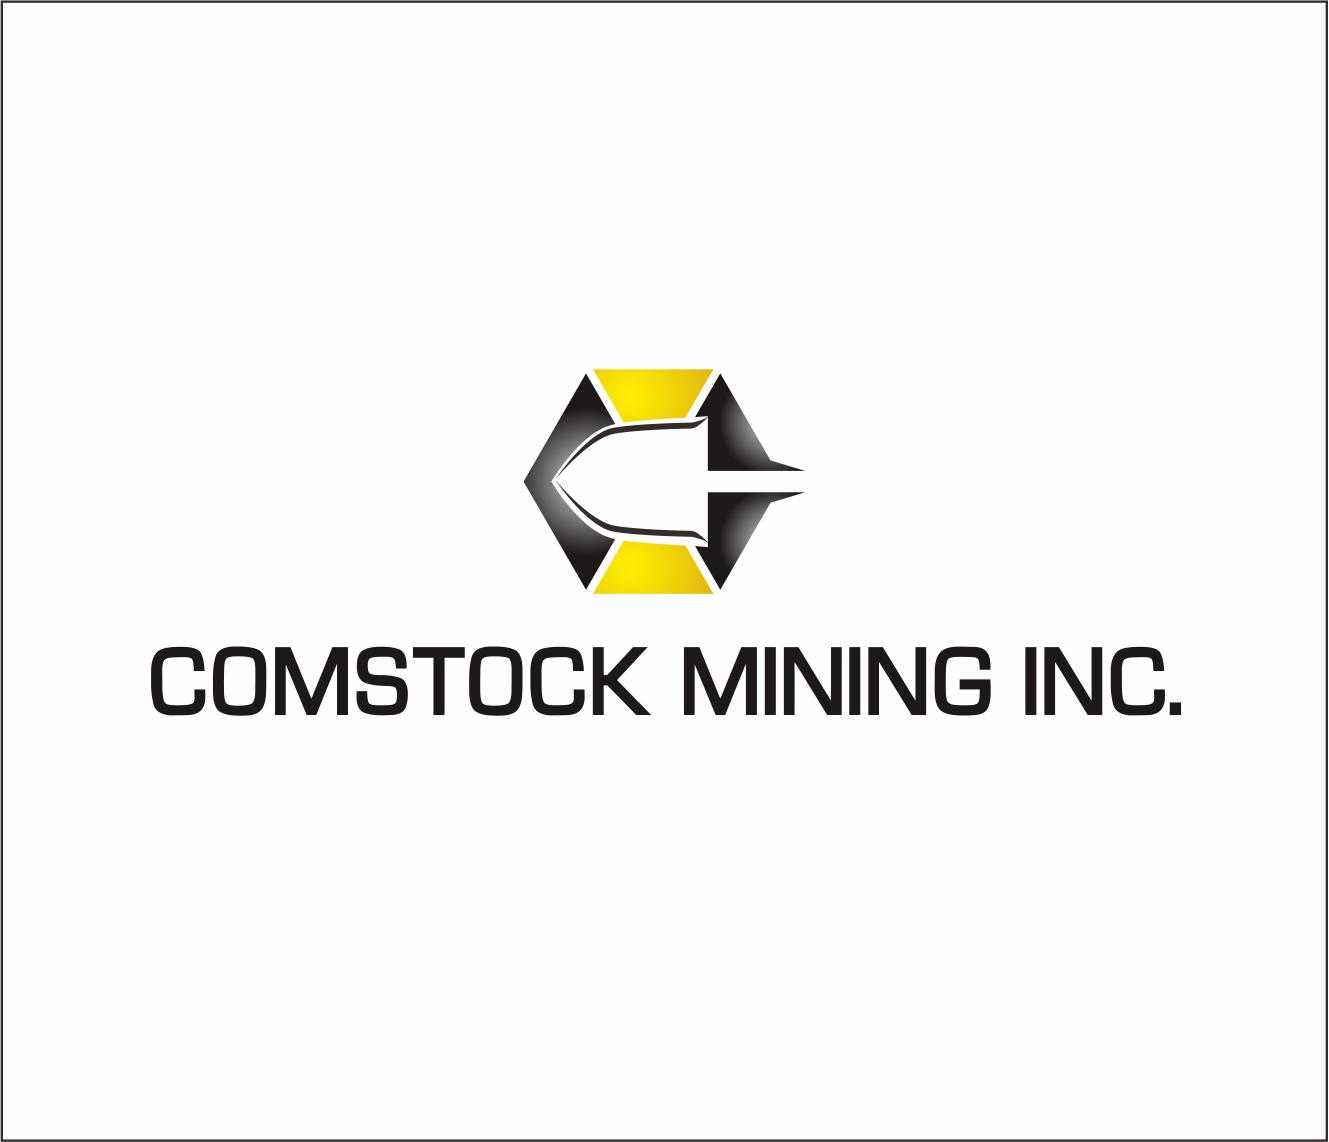 Logo Design by Armada Jamaluddin - Entry No. 52 in the Logo Design Contest Captivating Logo Design for Comstock Mining, Inc..